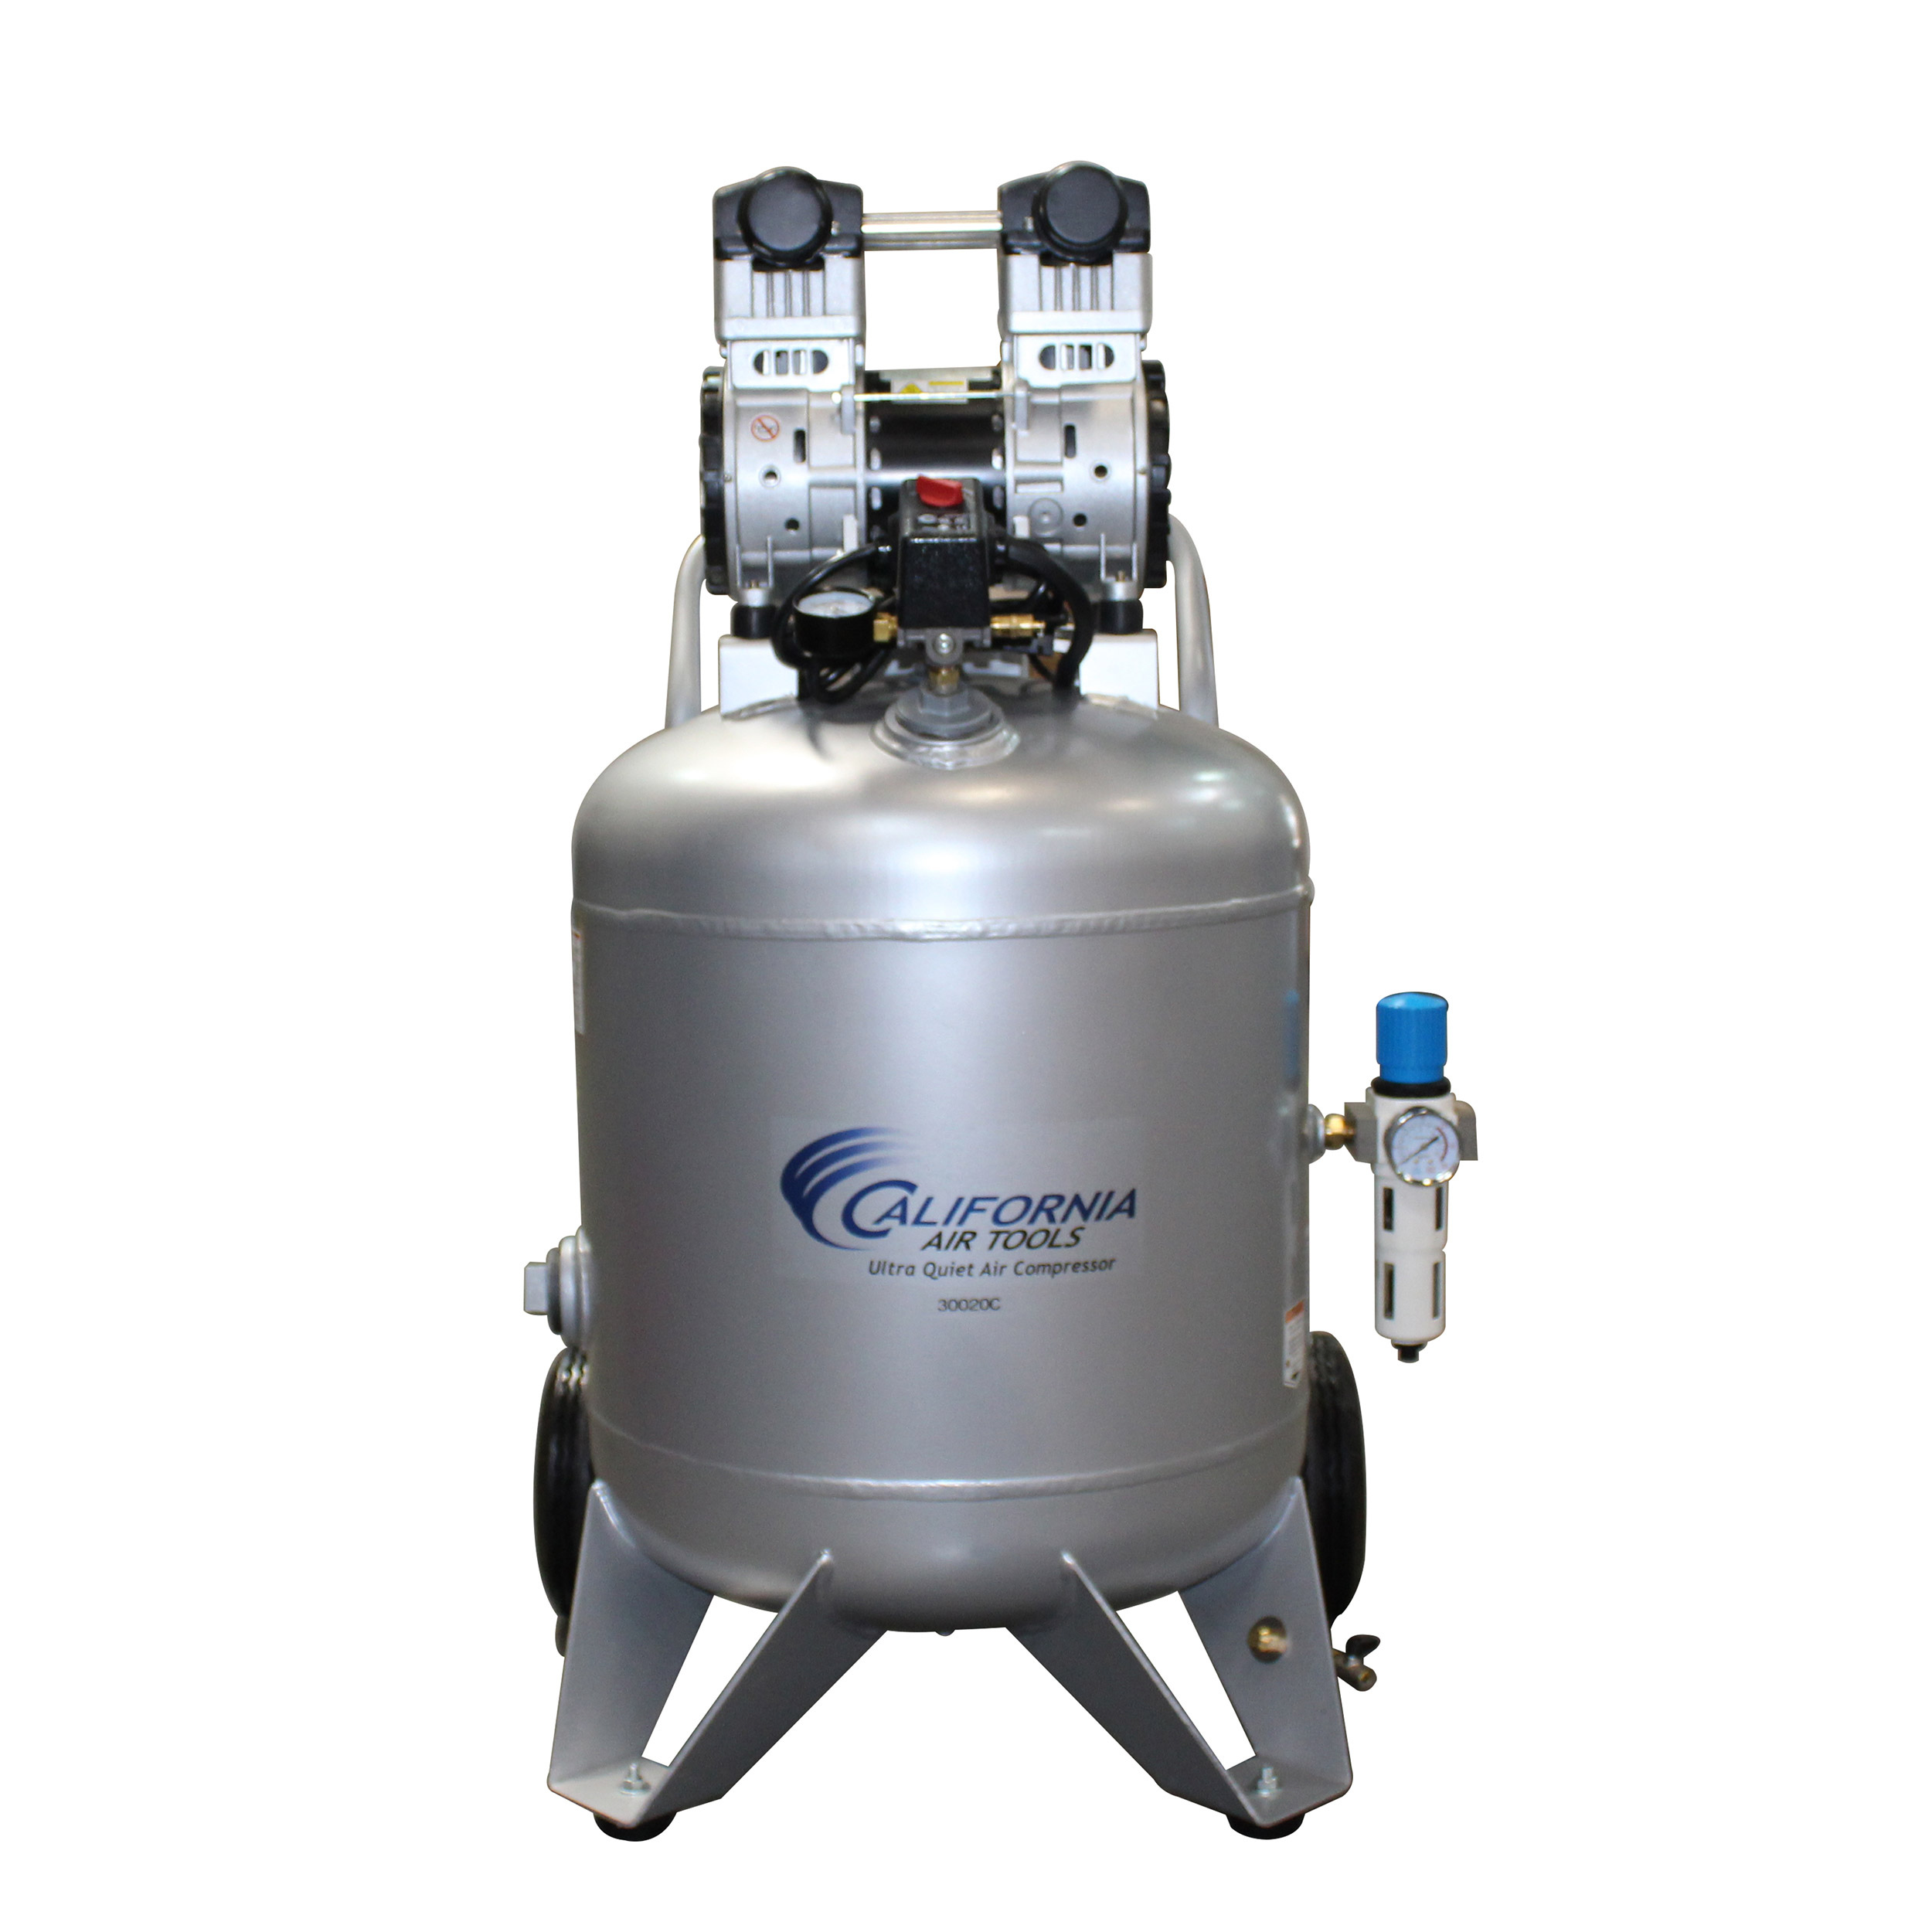 Steel Tank Air Compressor, 30020C, Ultra Quiet  & Oil-Free,  2.0 Hp, 30 gallon